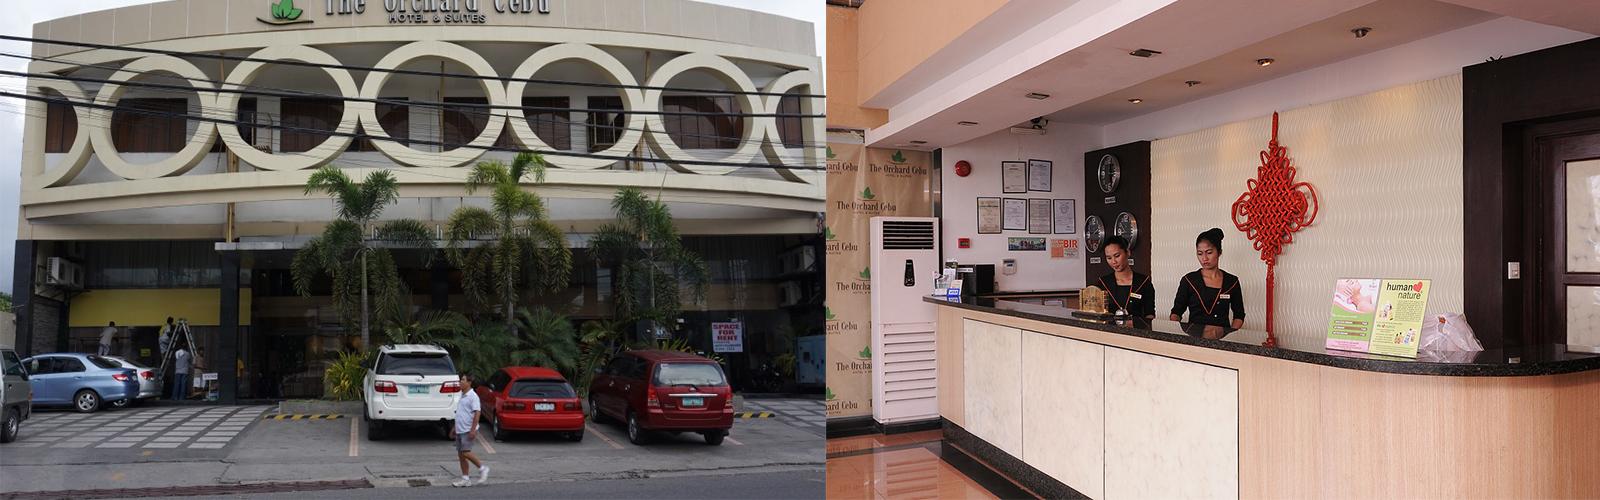 Orchard Cebu Hotel